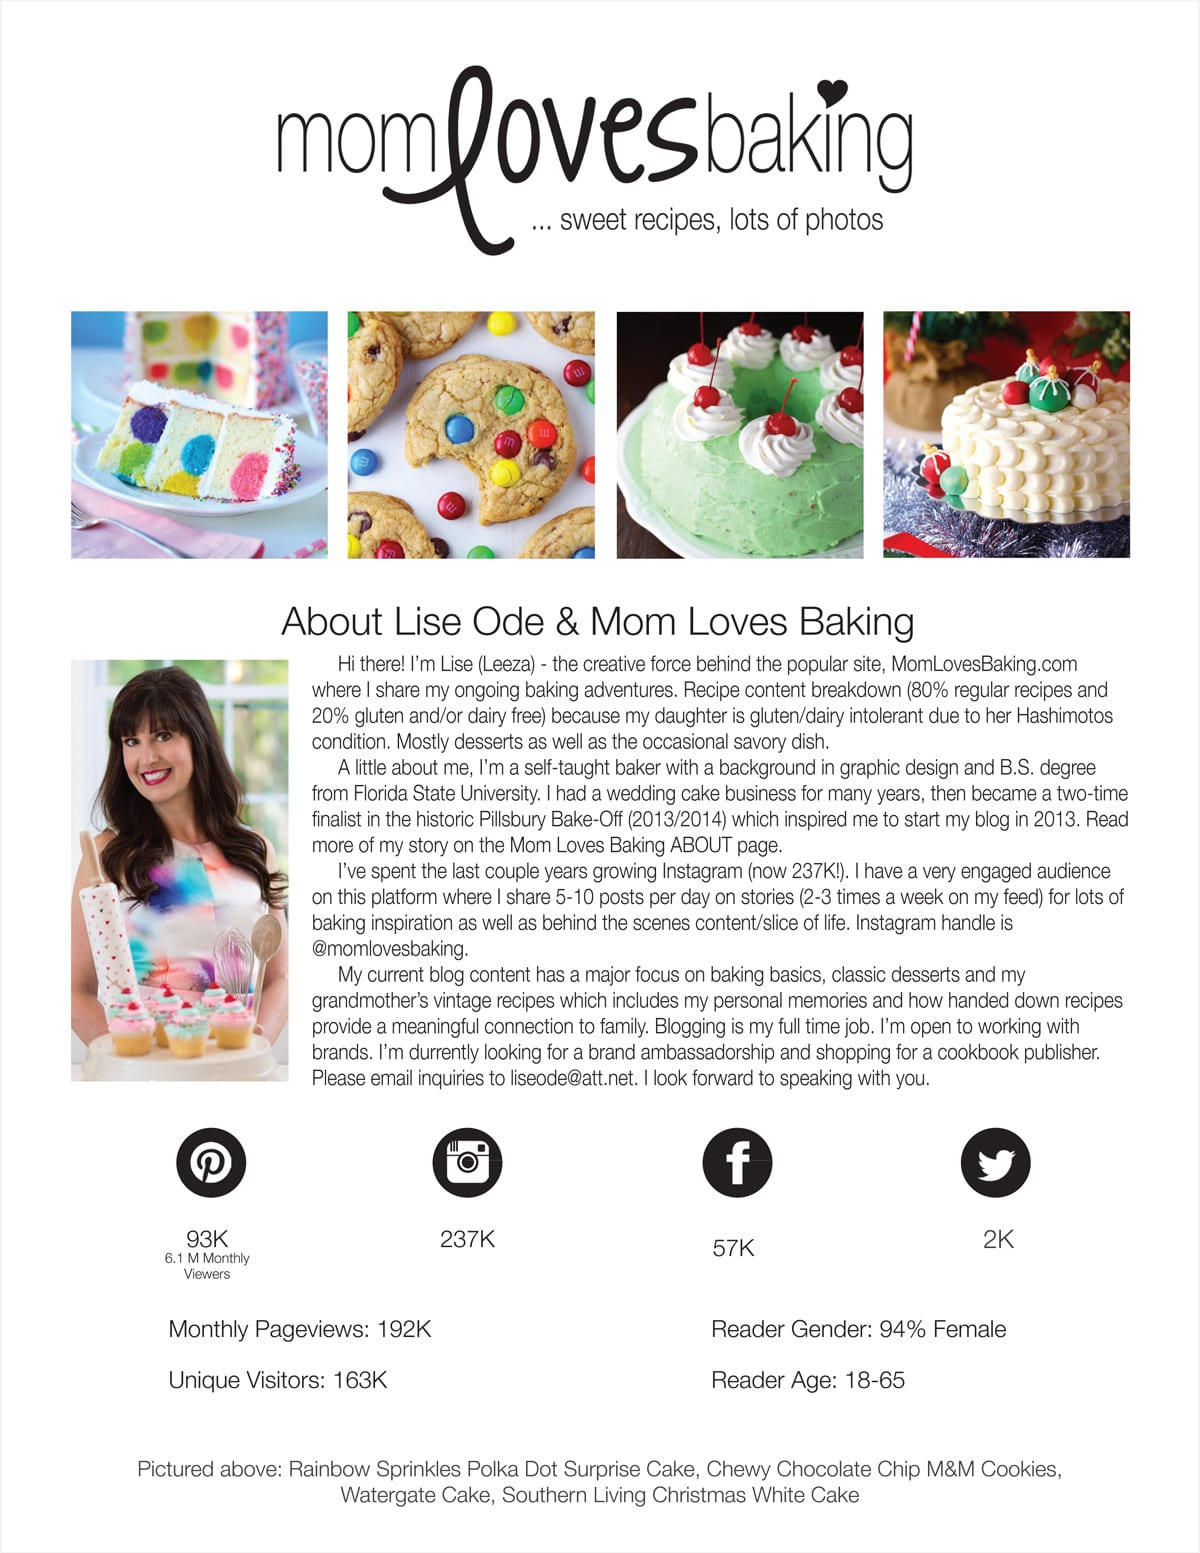 Media Kit for Mom Loves Baking page 1